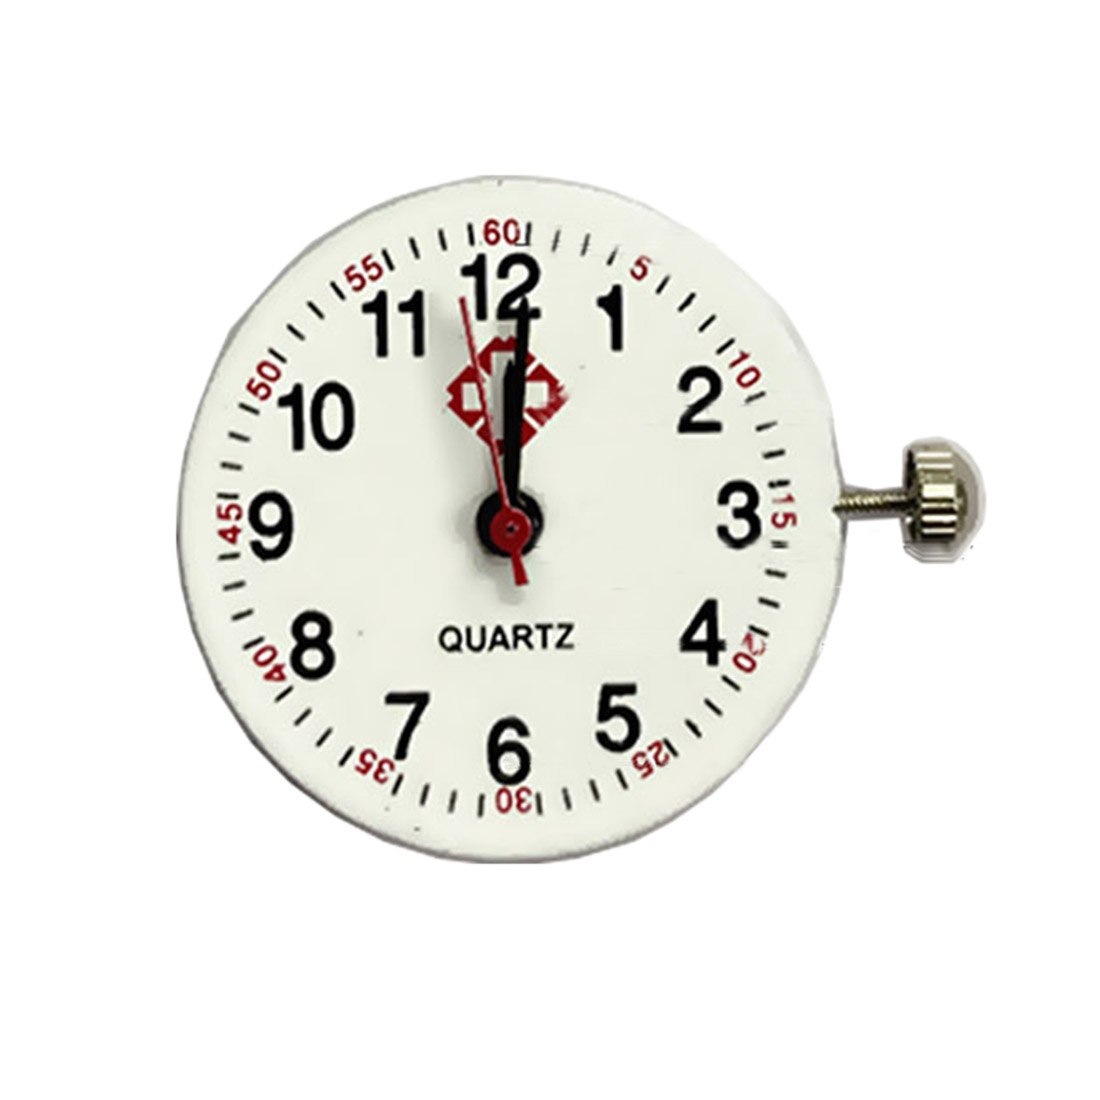 Купить с кэшбэком Brooch Tunic Fob Clip Nurse Doctor Pendant Pocket Quartz Red Cross Brooch Nurses Watch Fob Hanging Medical reloj de bolsillo